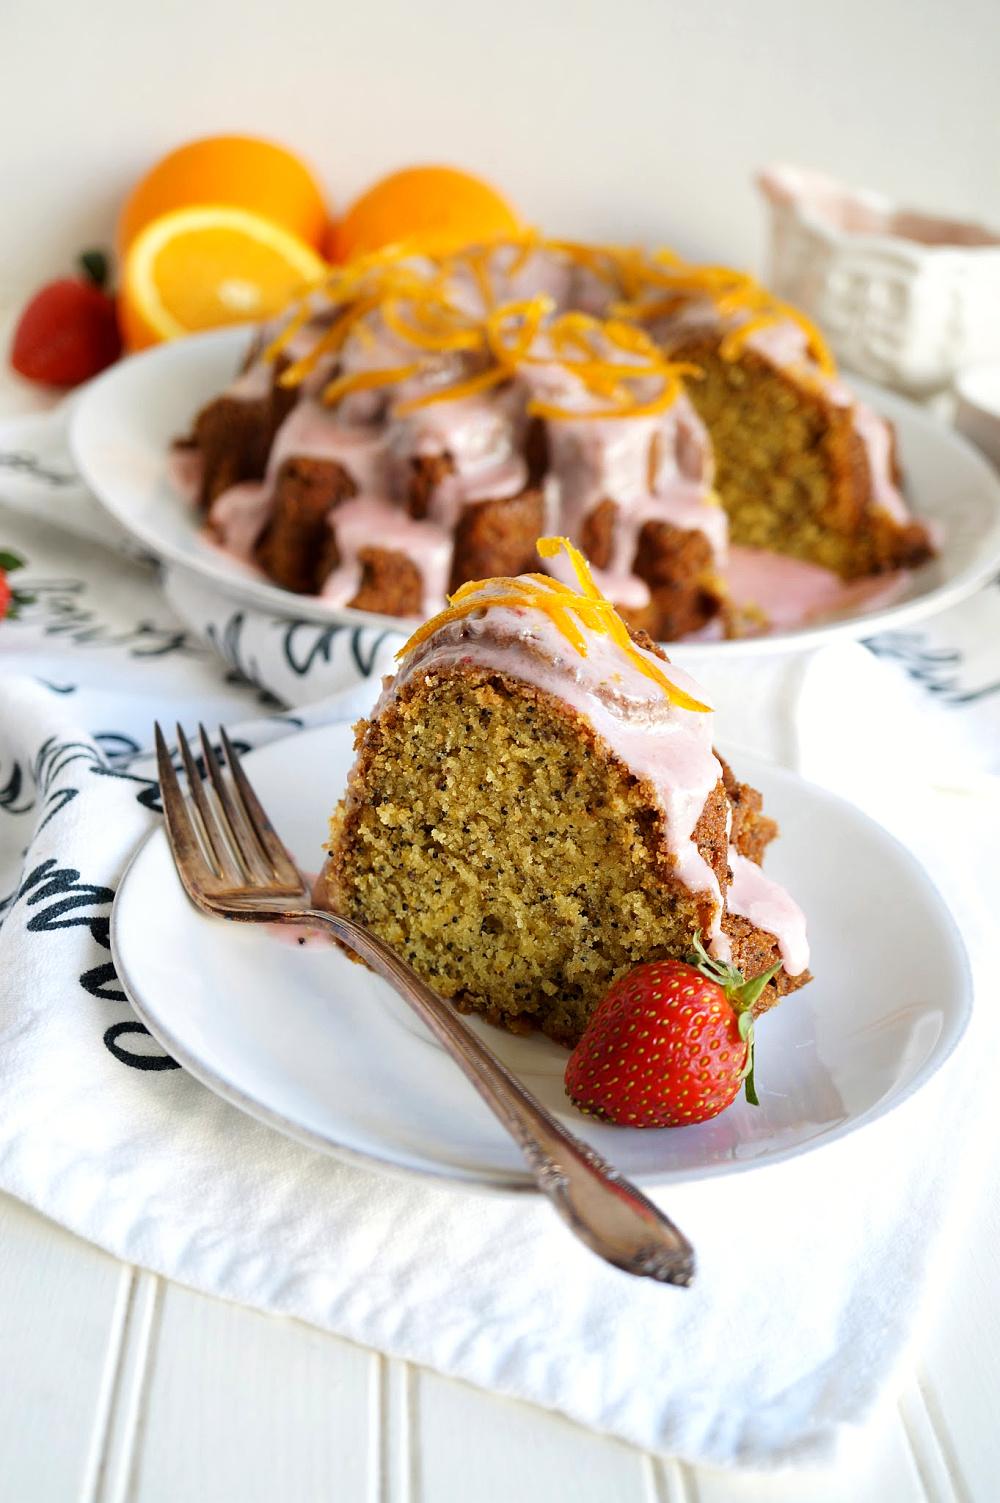 slice of orange poppyseed bundt cake